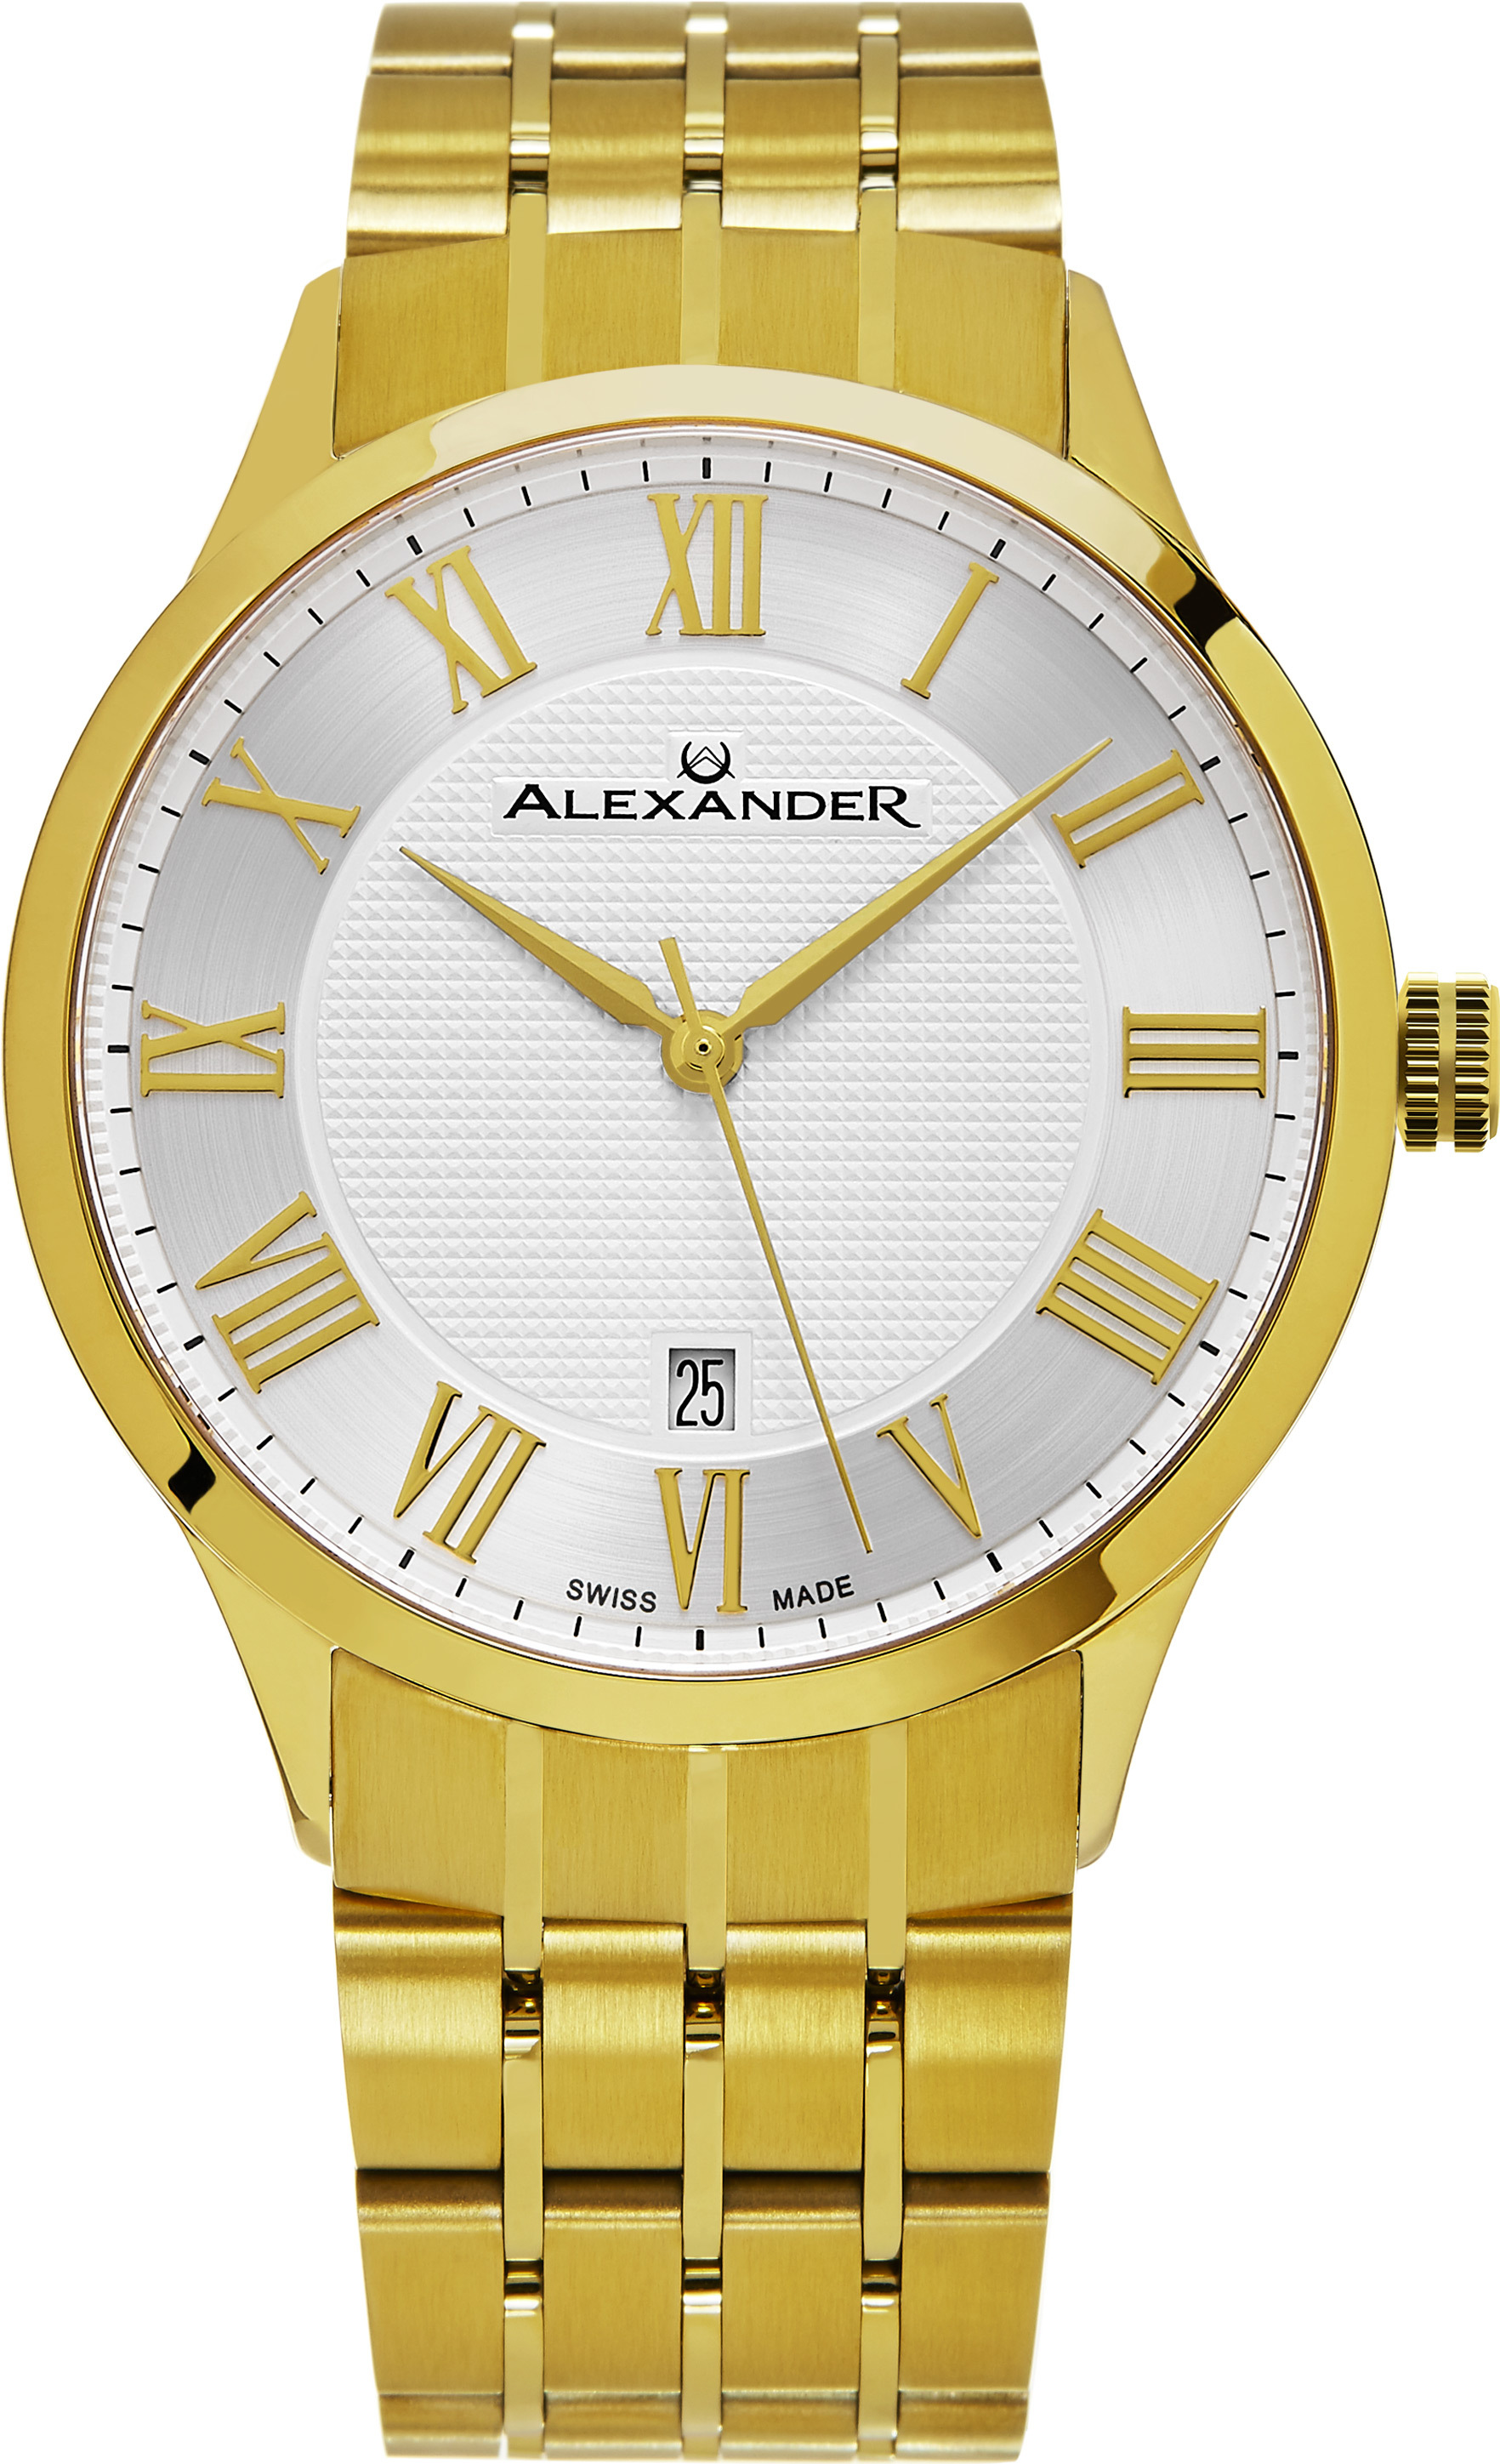 Alexander Statesman Herrklocka A103B-03 Silverfärgad/Gulguldtonat stål - Alexander